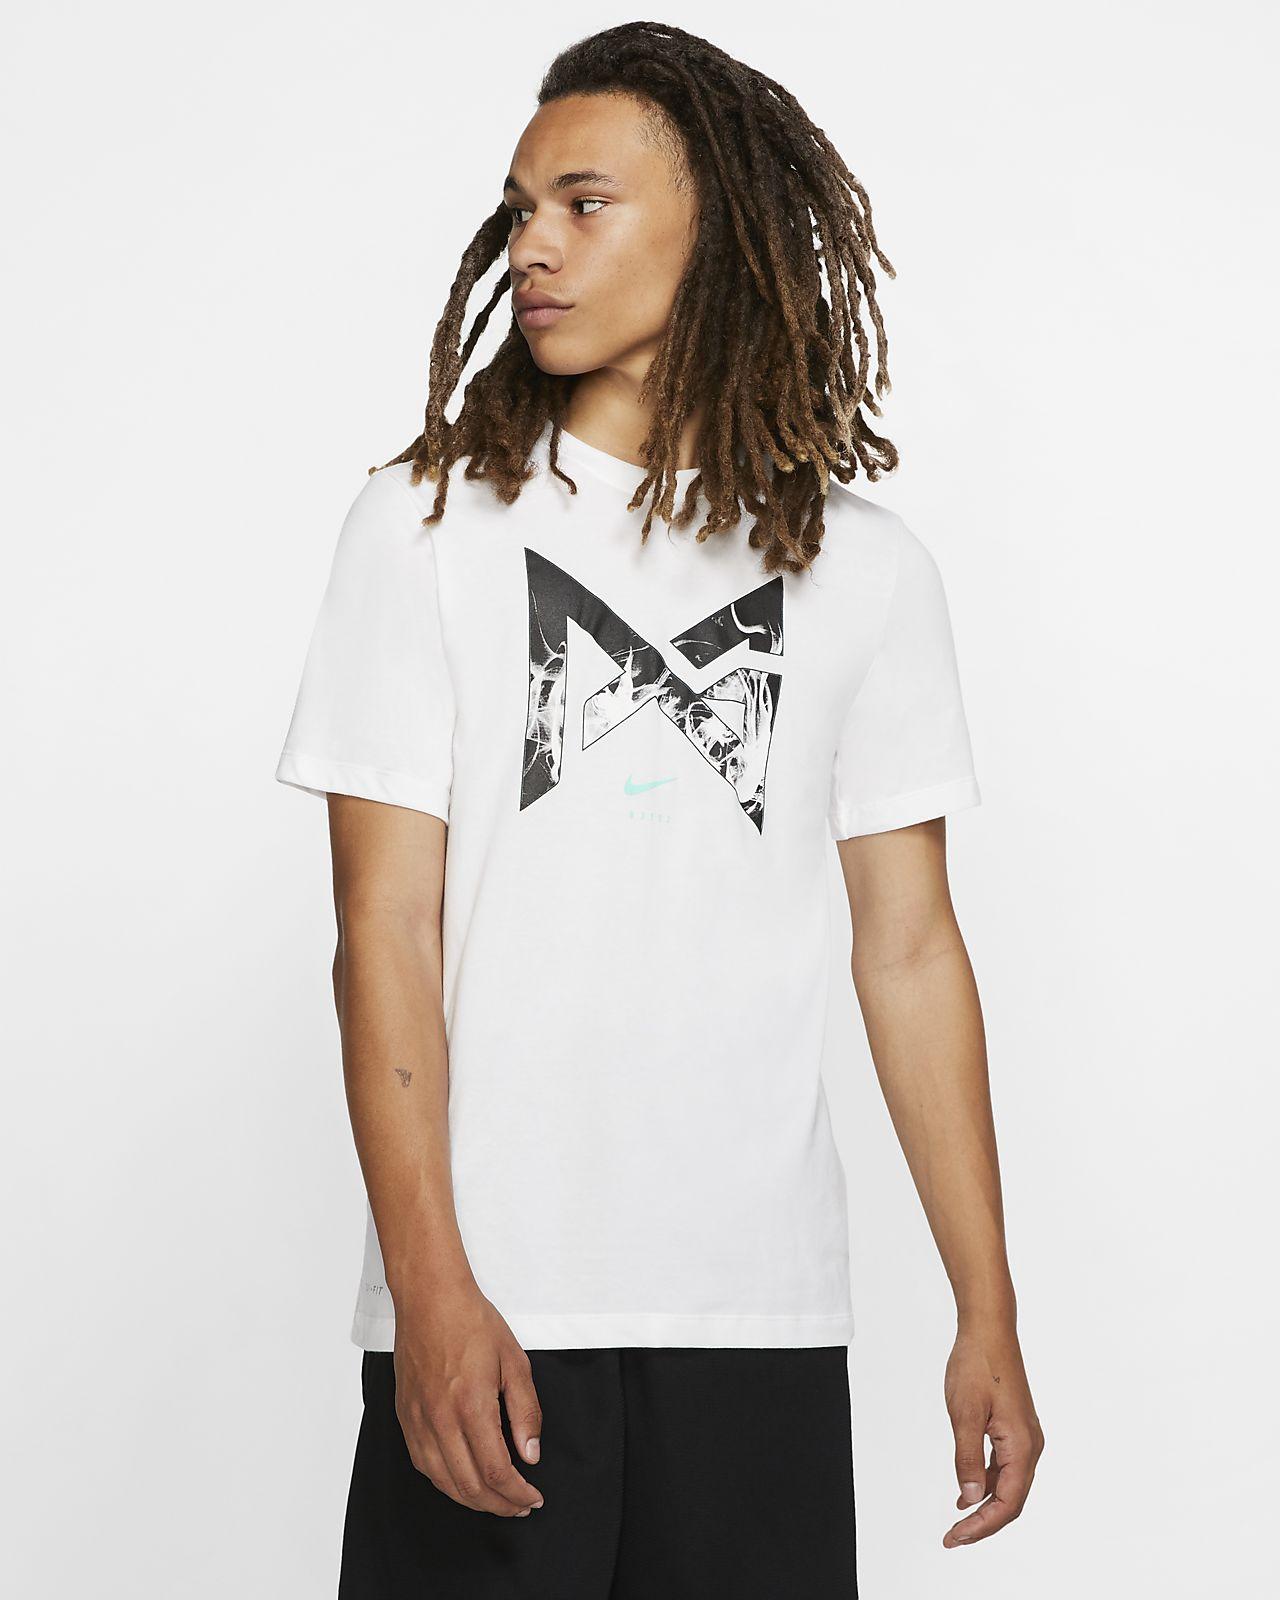 Tee-shirt de basketball PG Nike Dri-FIT pour Homme